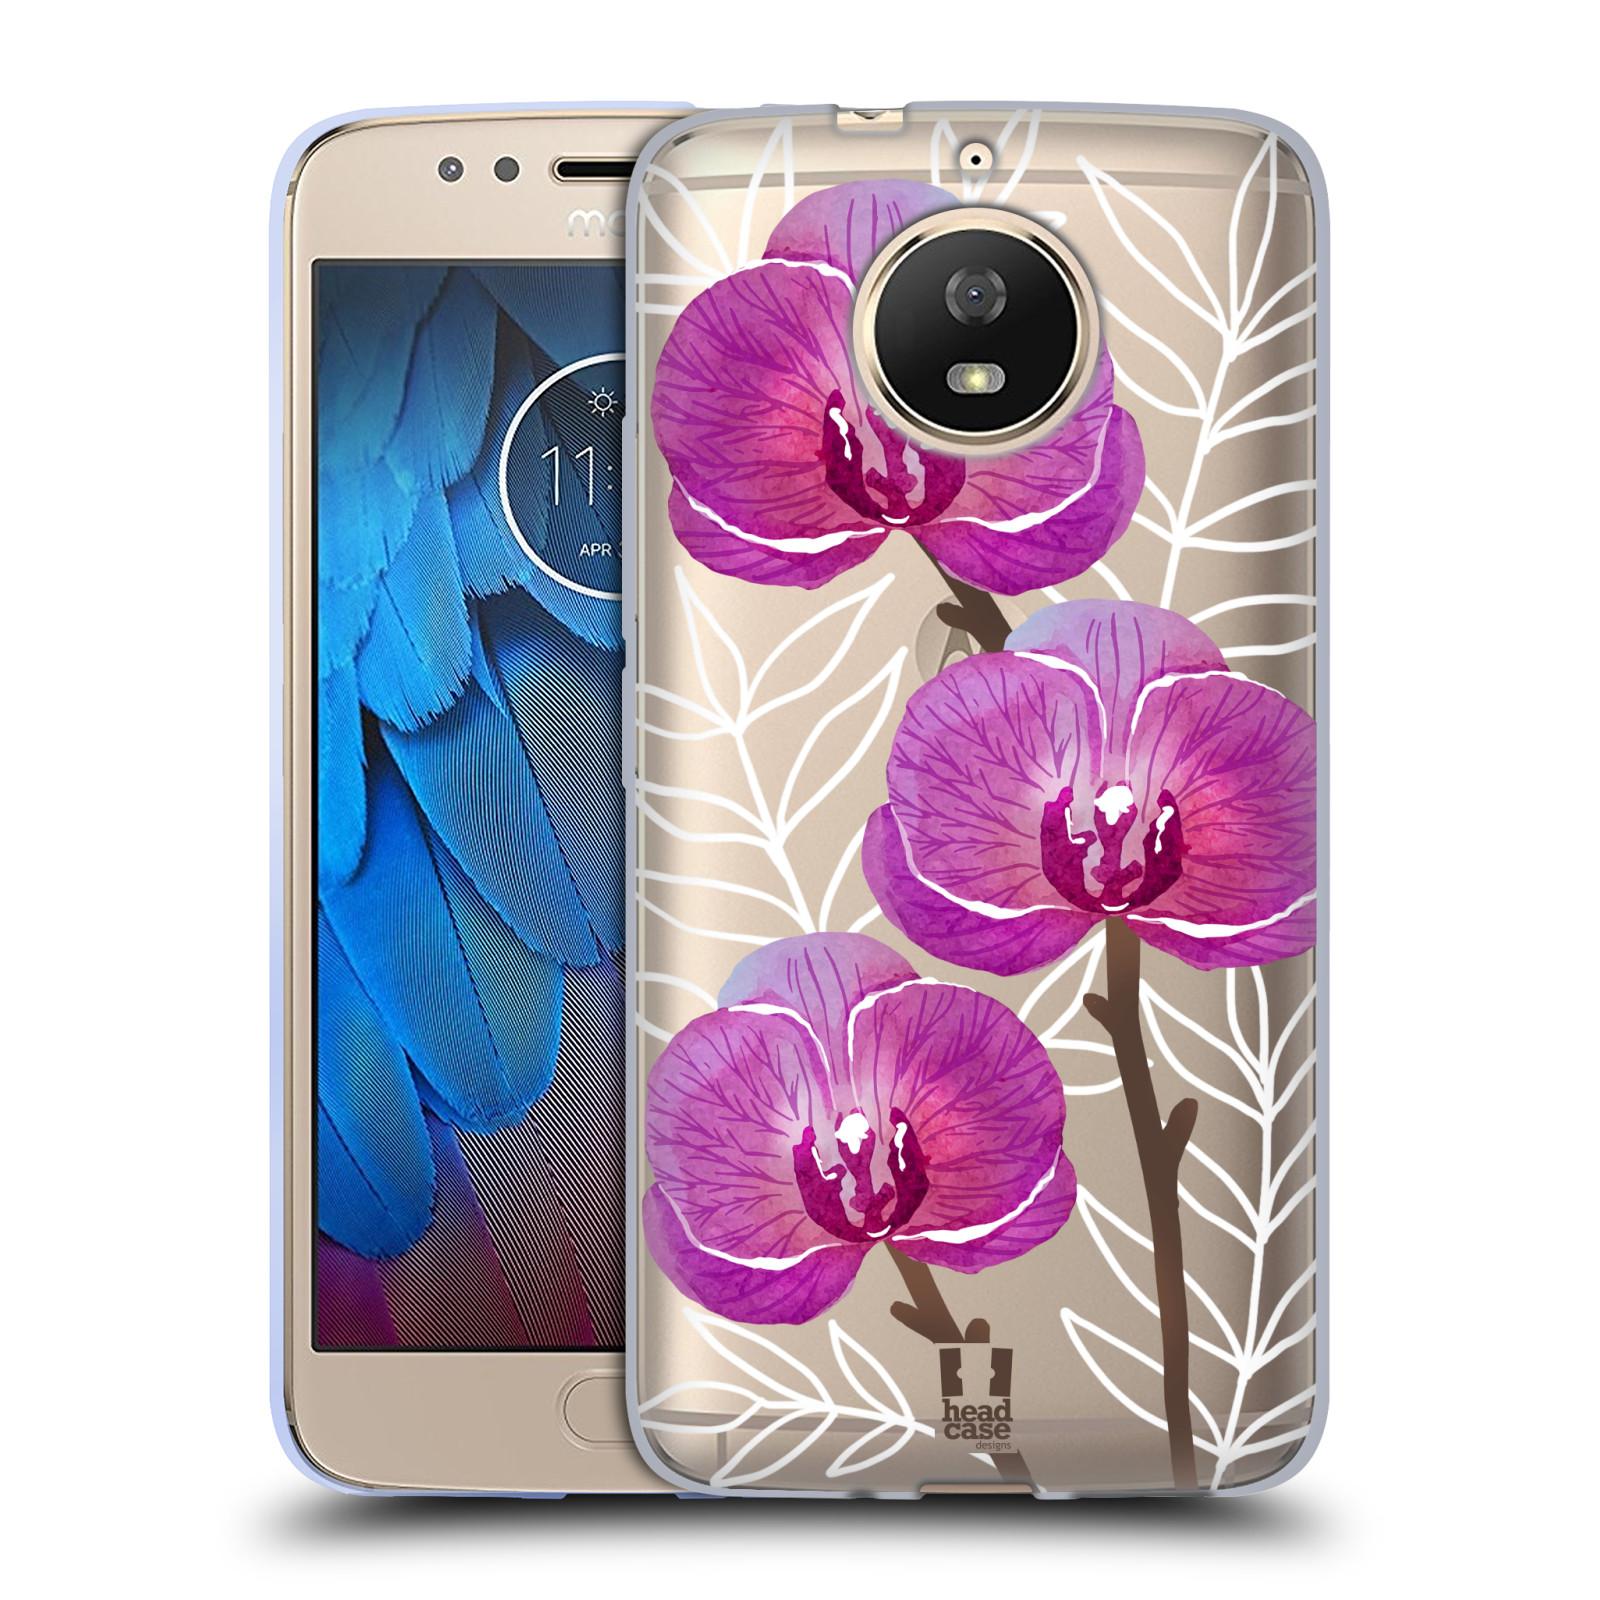 Silikonové pouzdro na mobil Lenovo Moto G5s - Head Case - Hezoučké kvítky - průhledné